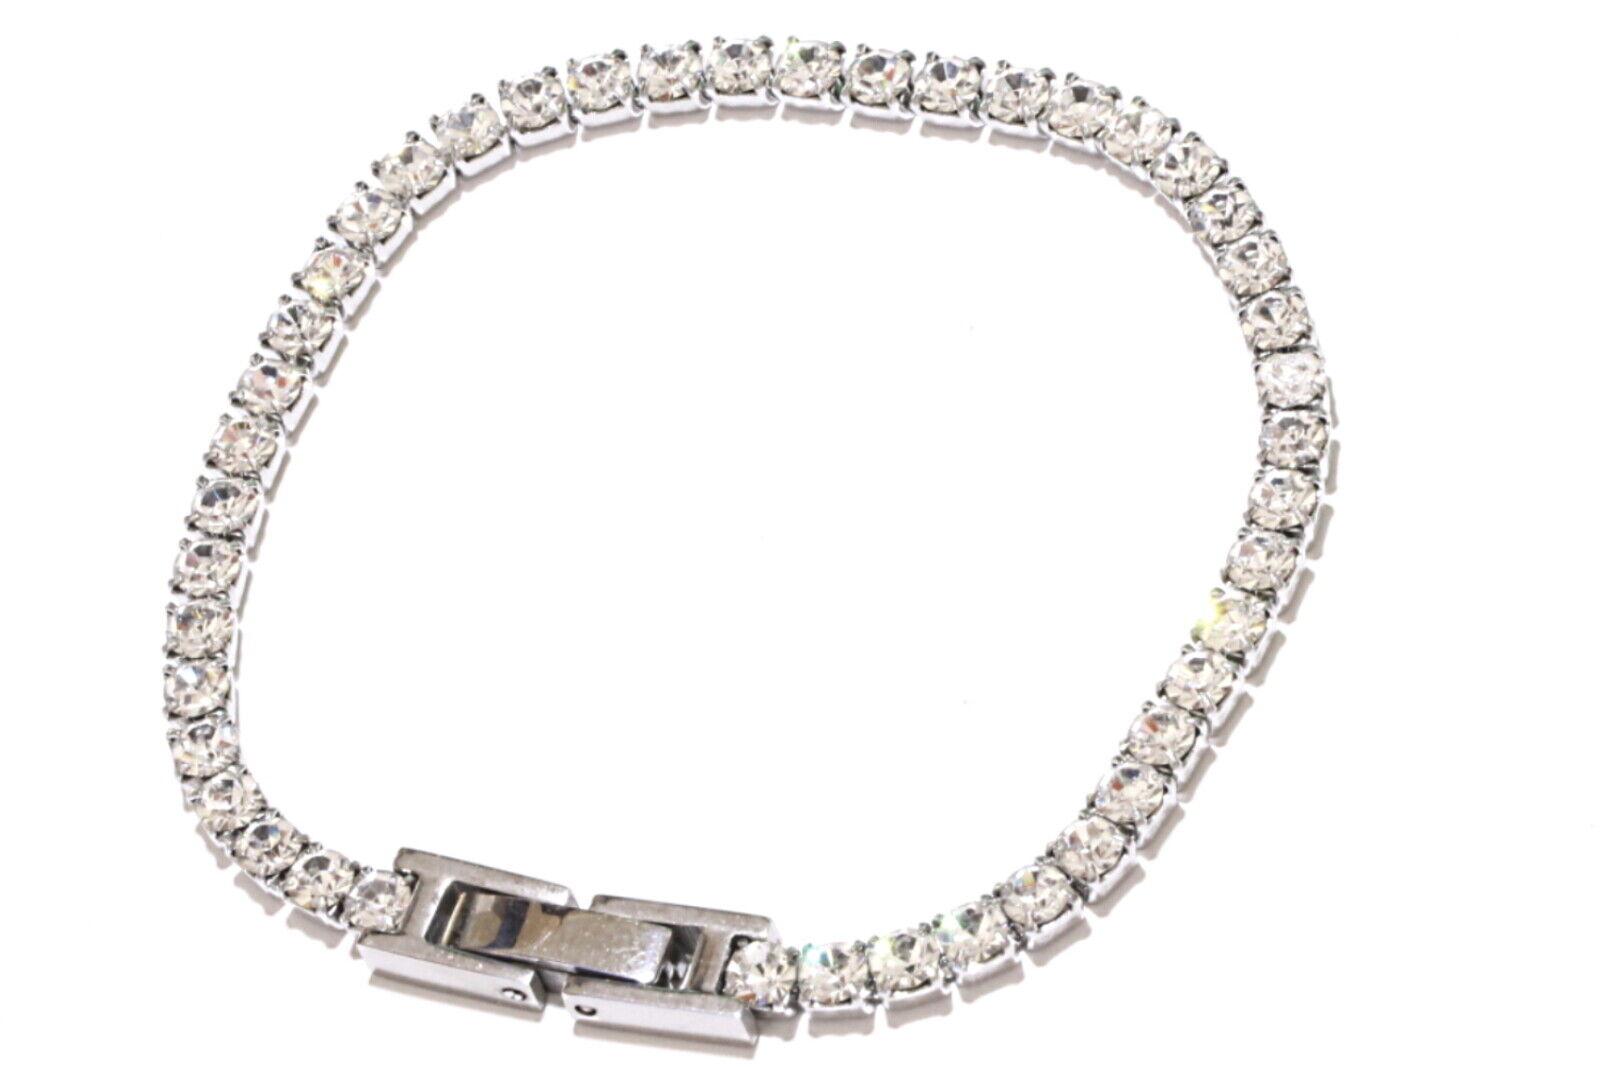 Unisex Edelstahl Tennis Armband mit Swarovski Kristall Silber Kette Partner Reif